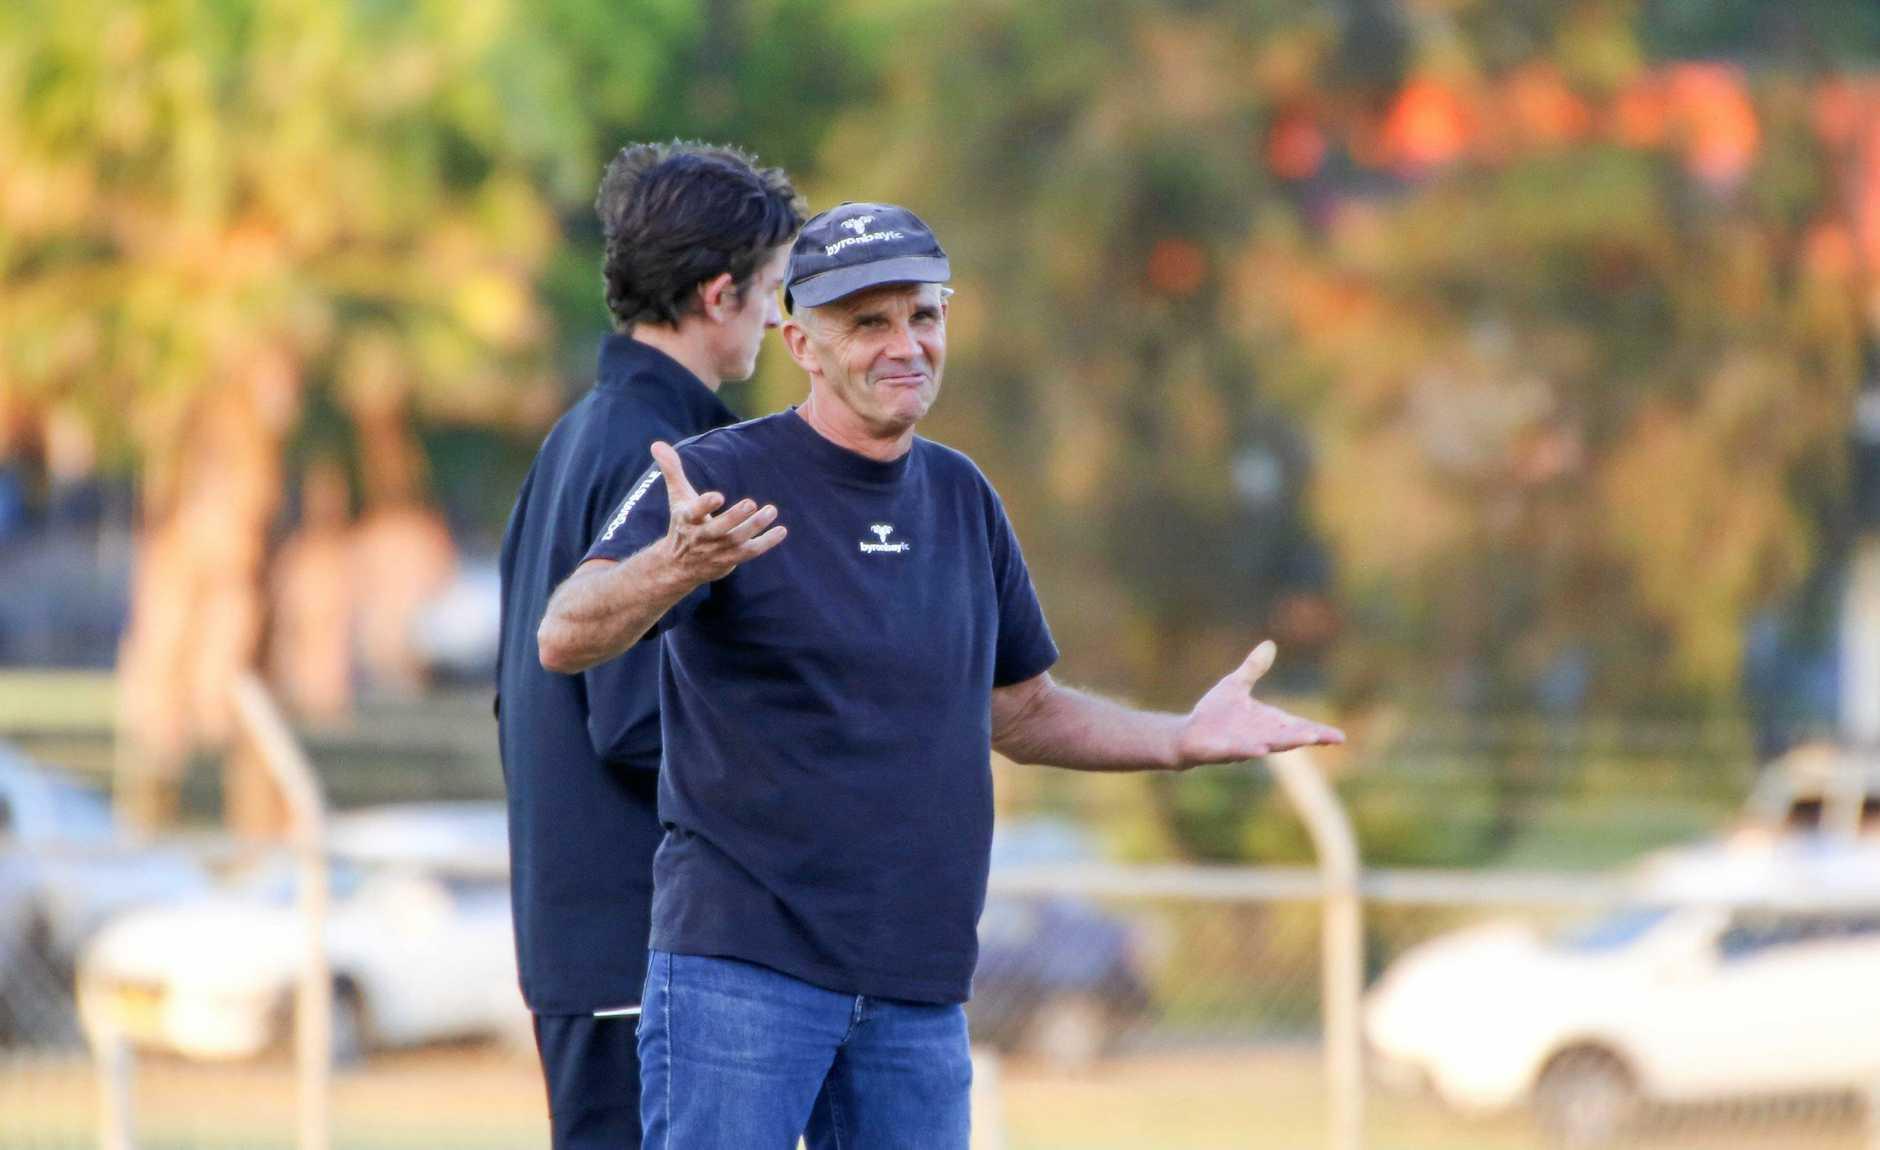 FAREWELL: Cest la vie! Retiring Coach Damon Bell leaves an extraordinary legacy at Byron Bay FC.